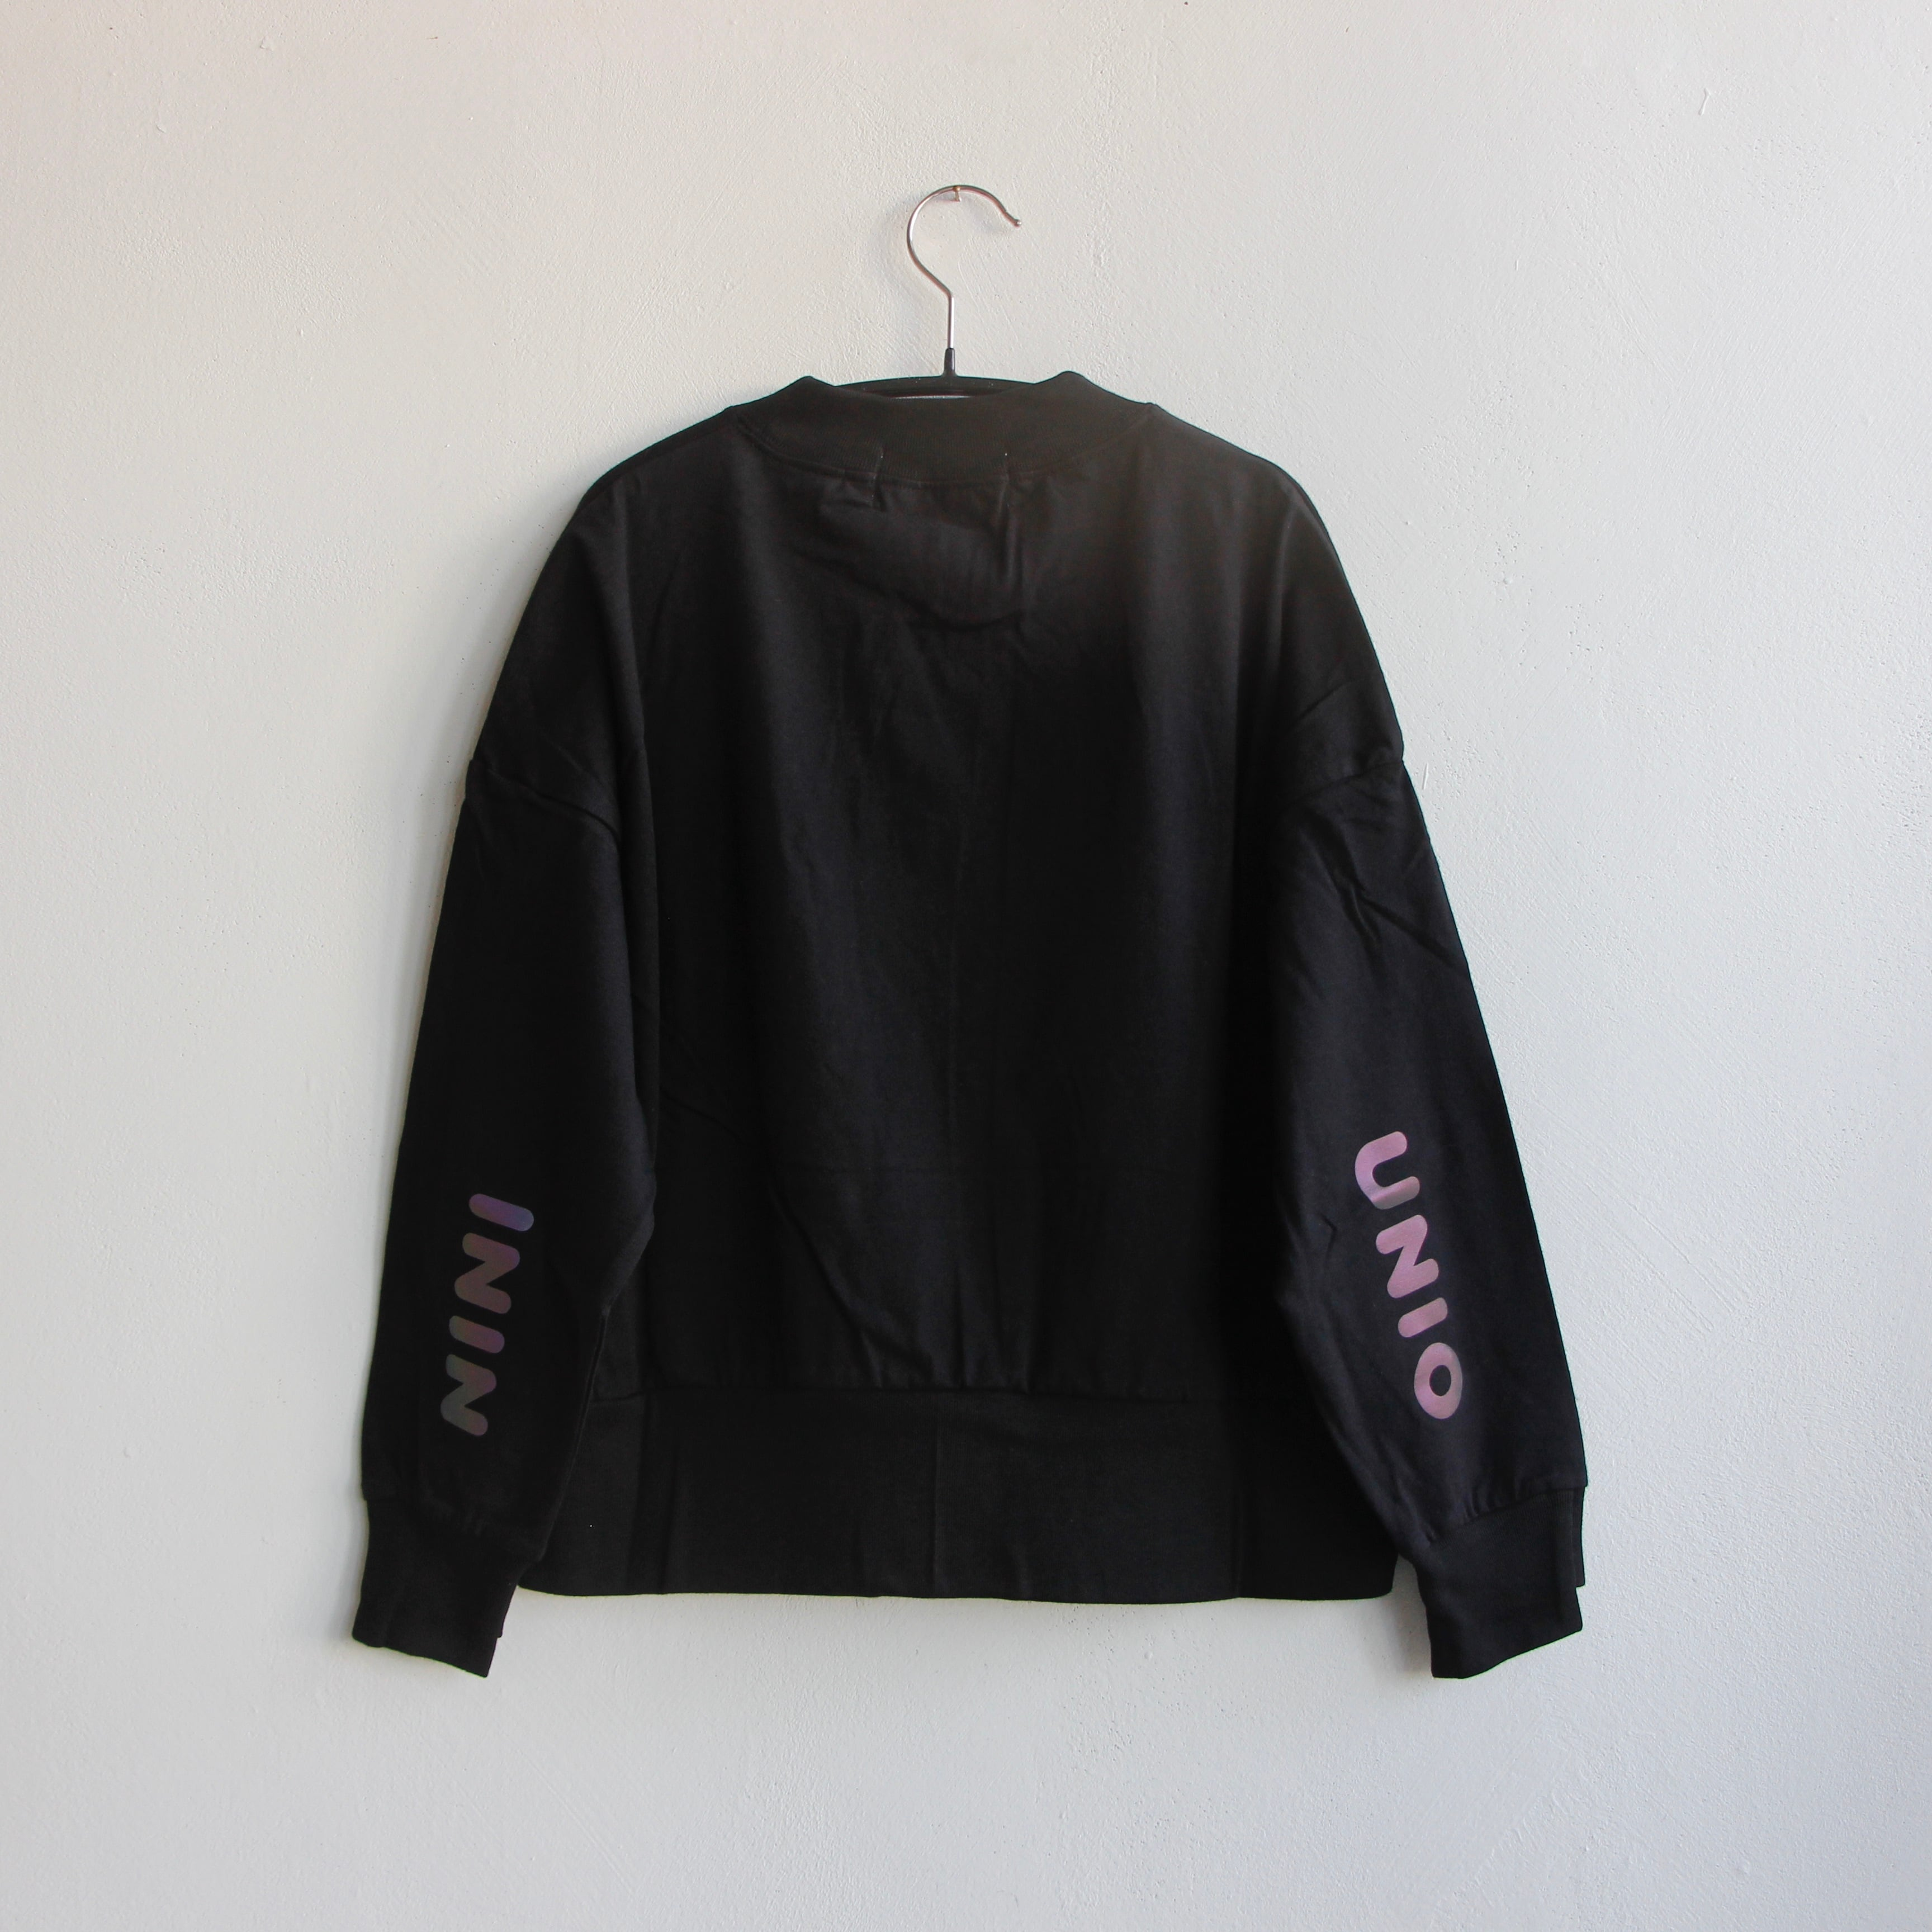 《UNIONINI 2021AW》reflect logo long sleeved tee /  black / 大人S・M